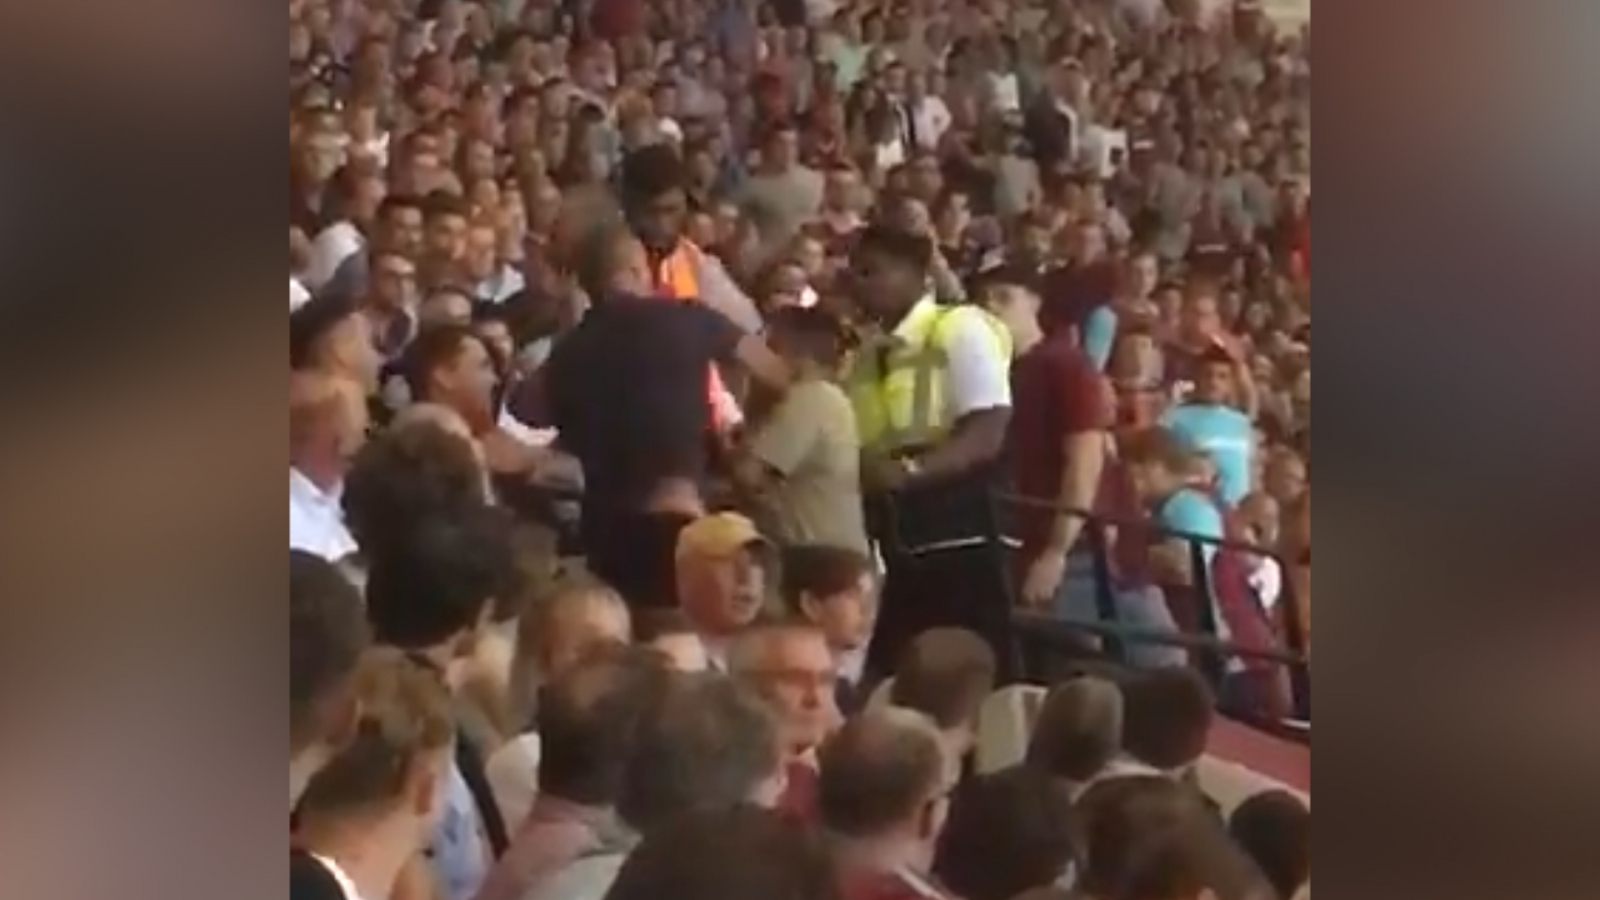 West Ham fans fighting